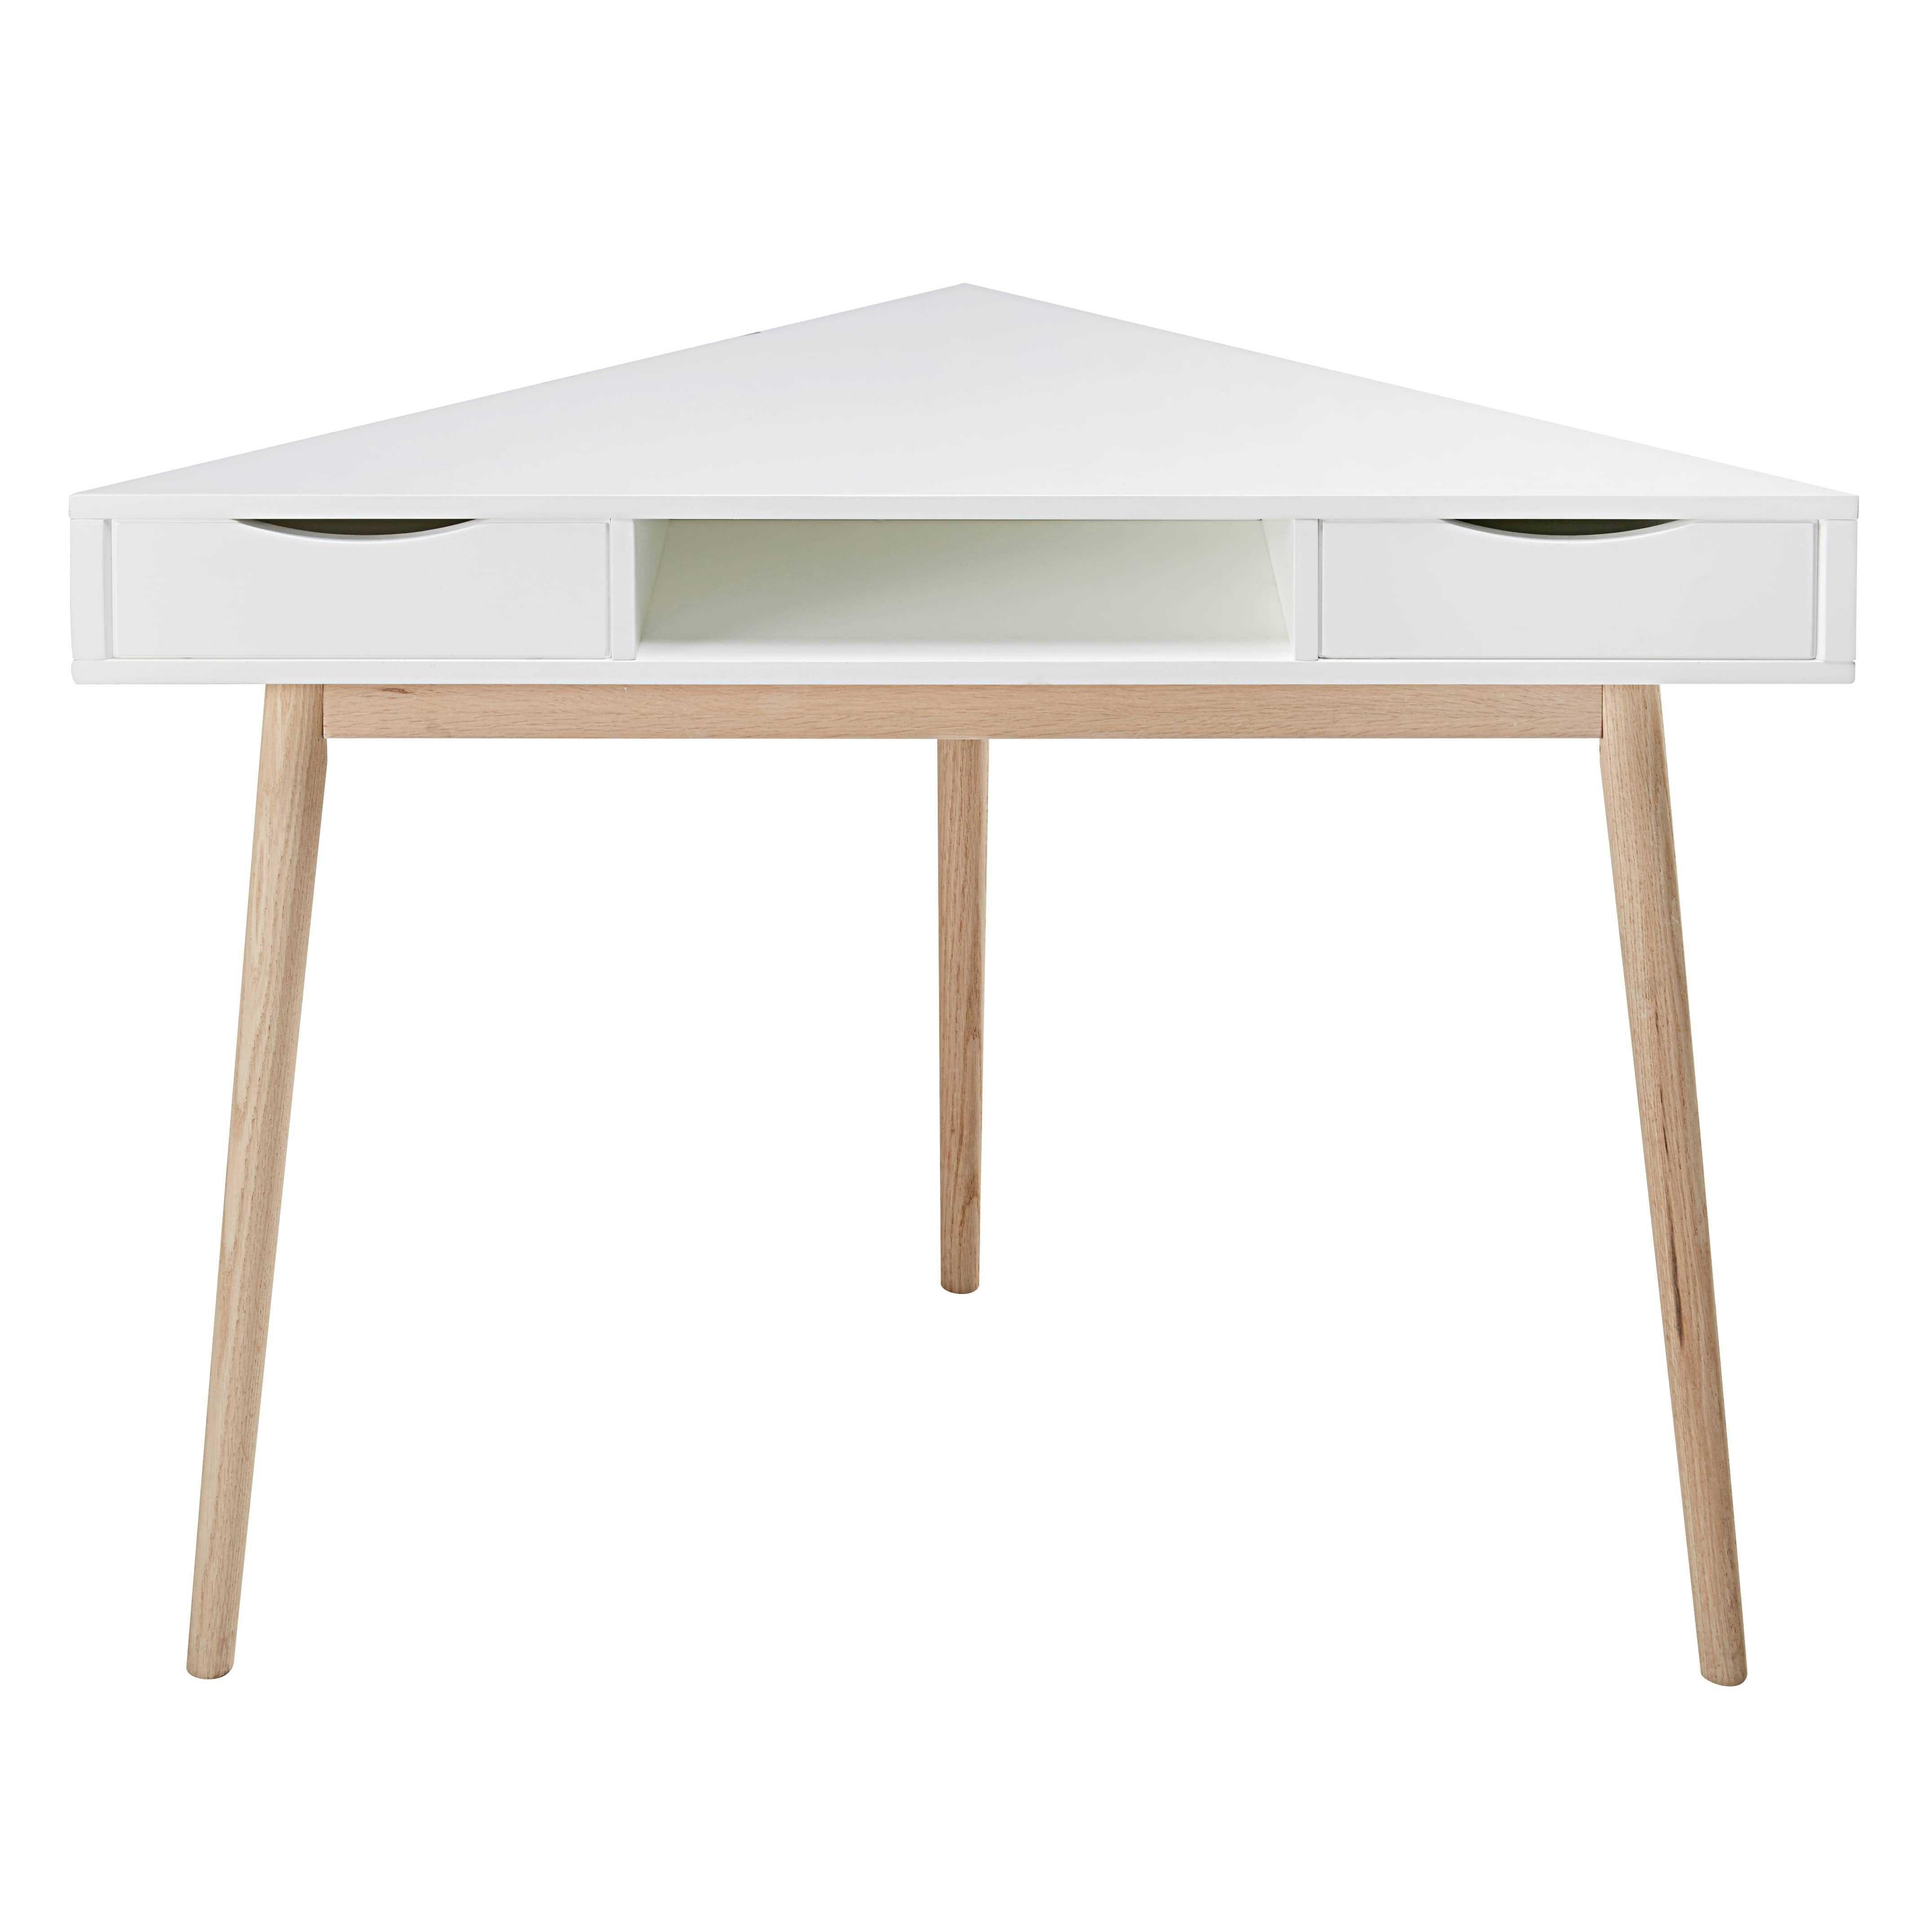 e030f61cced423a60dce04608f1cd9e7 Impressionnant De Table Petit Espace Concept